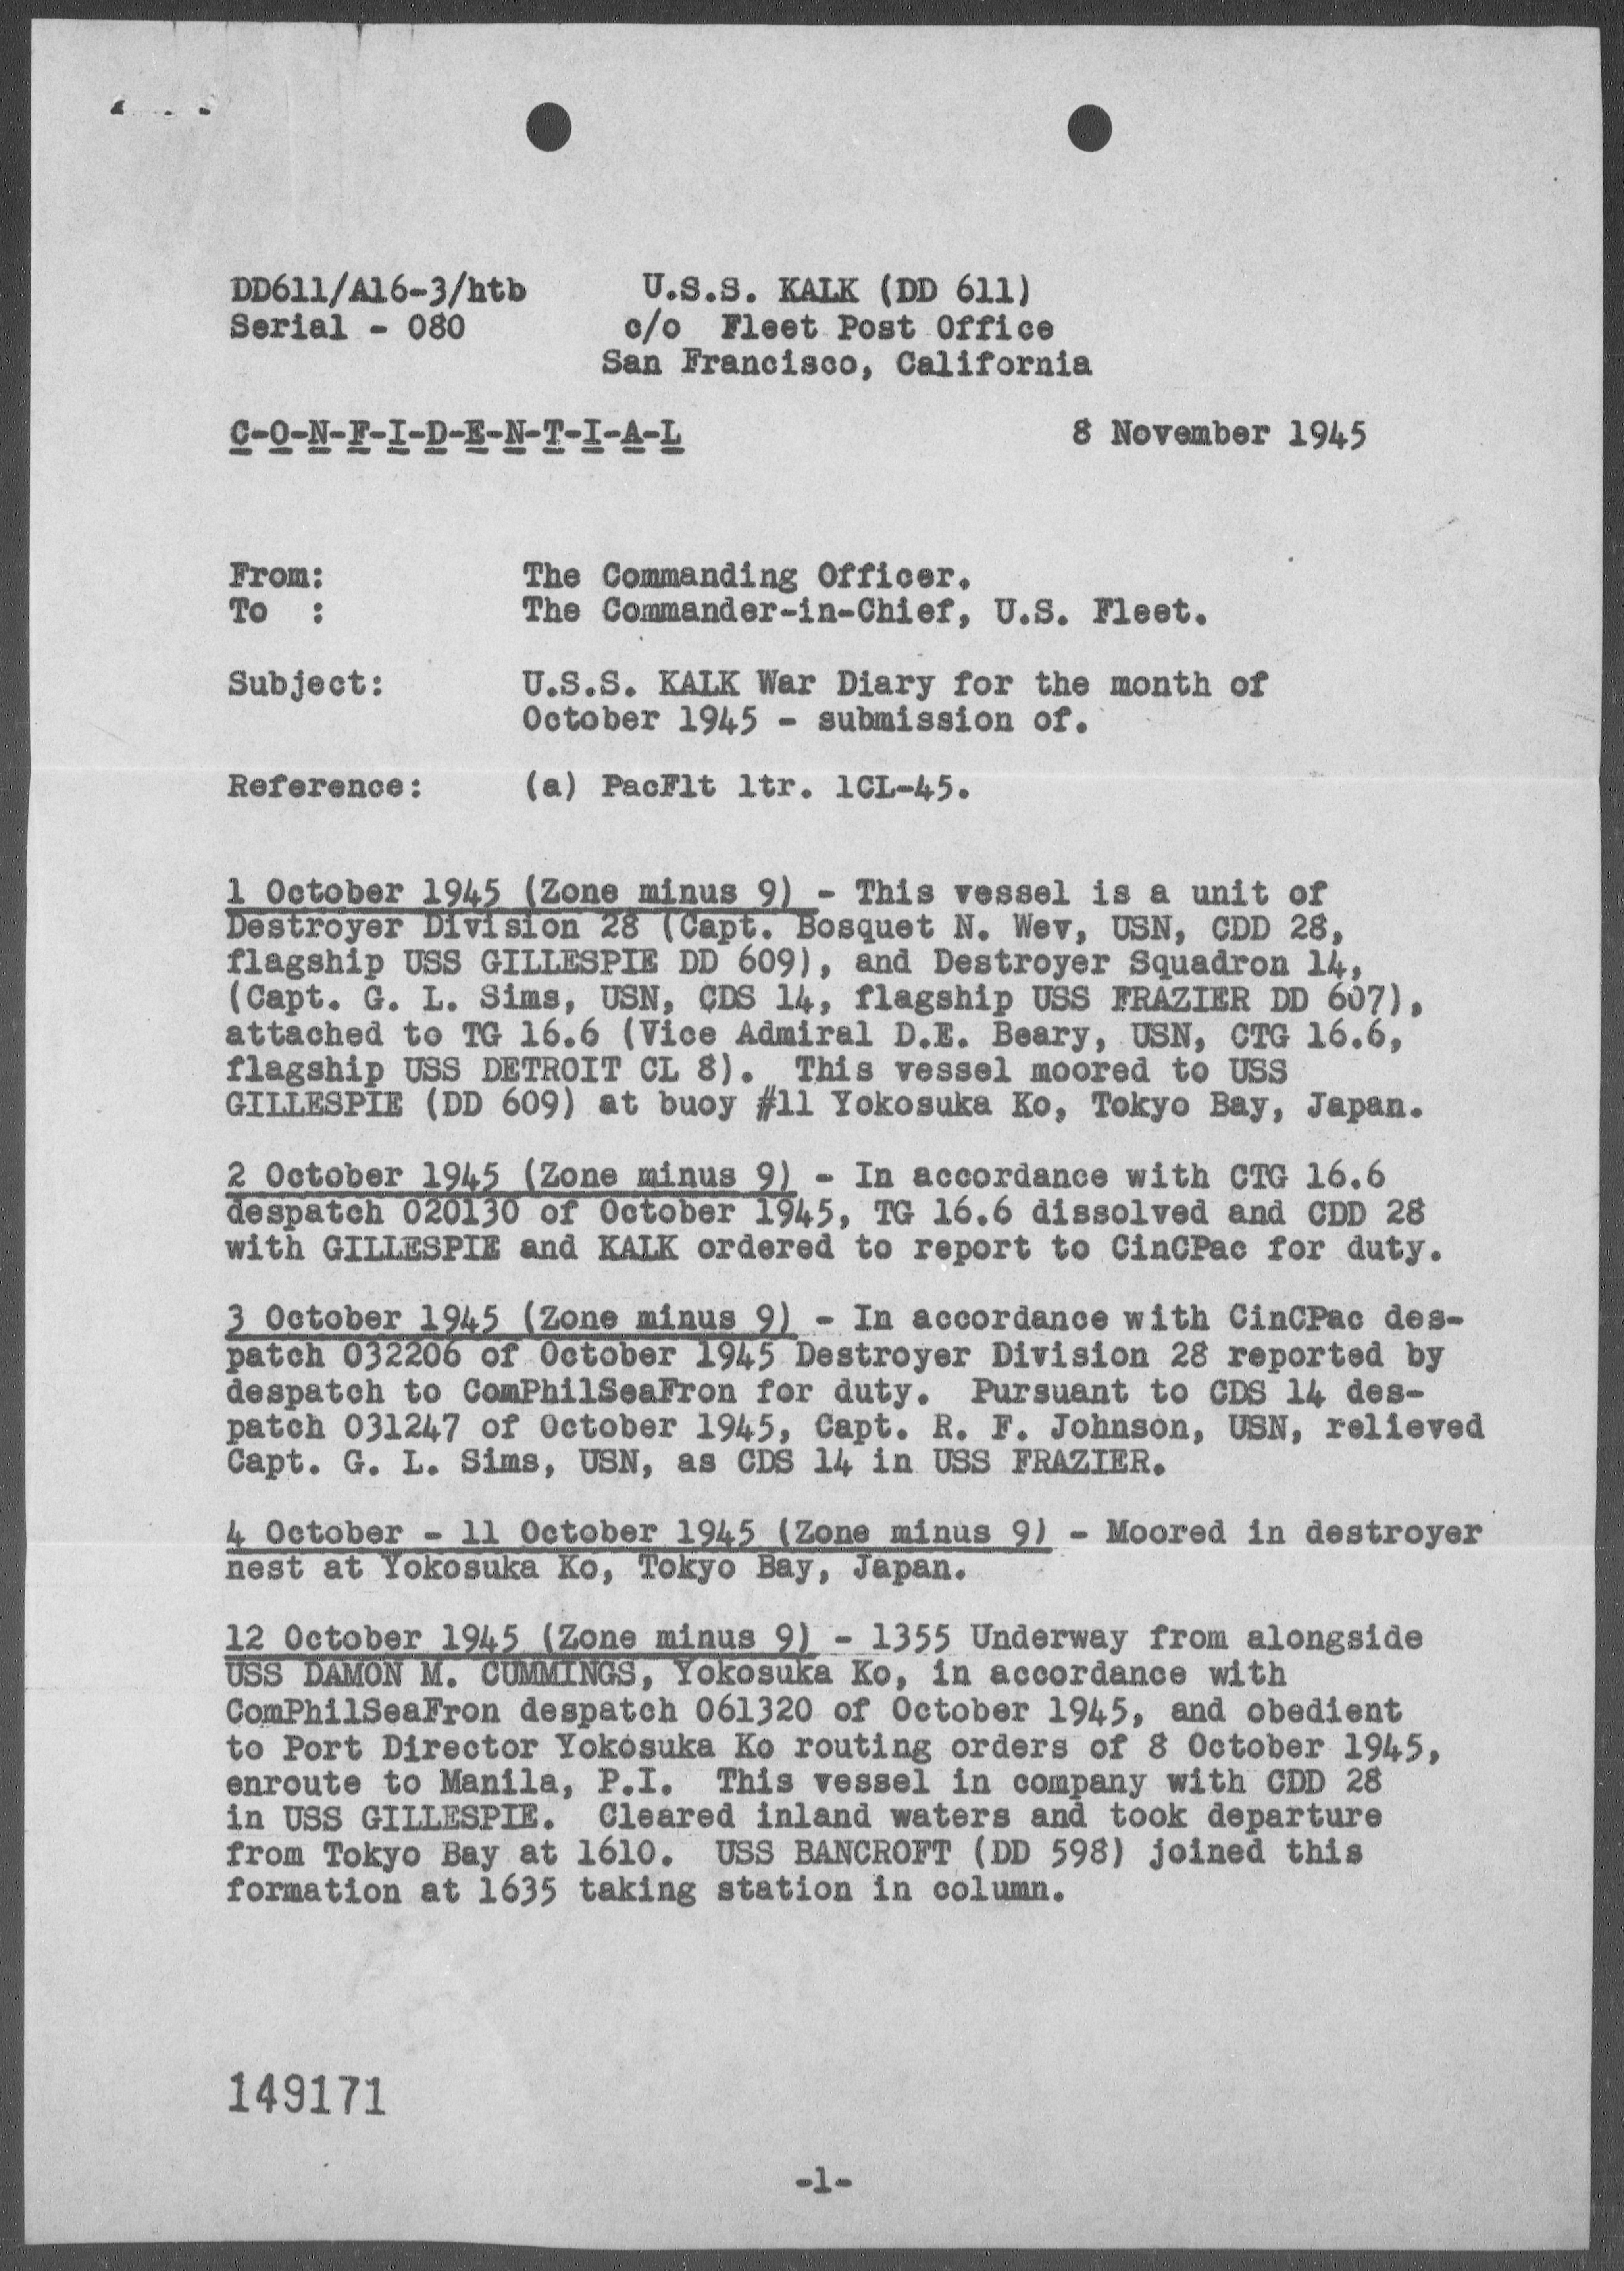 USS KALK - War Diary, 10/1-31/45